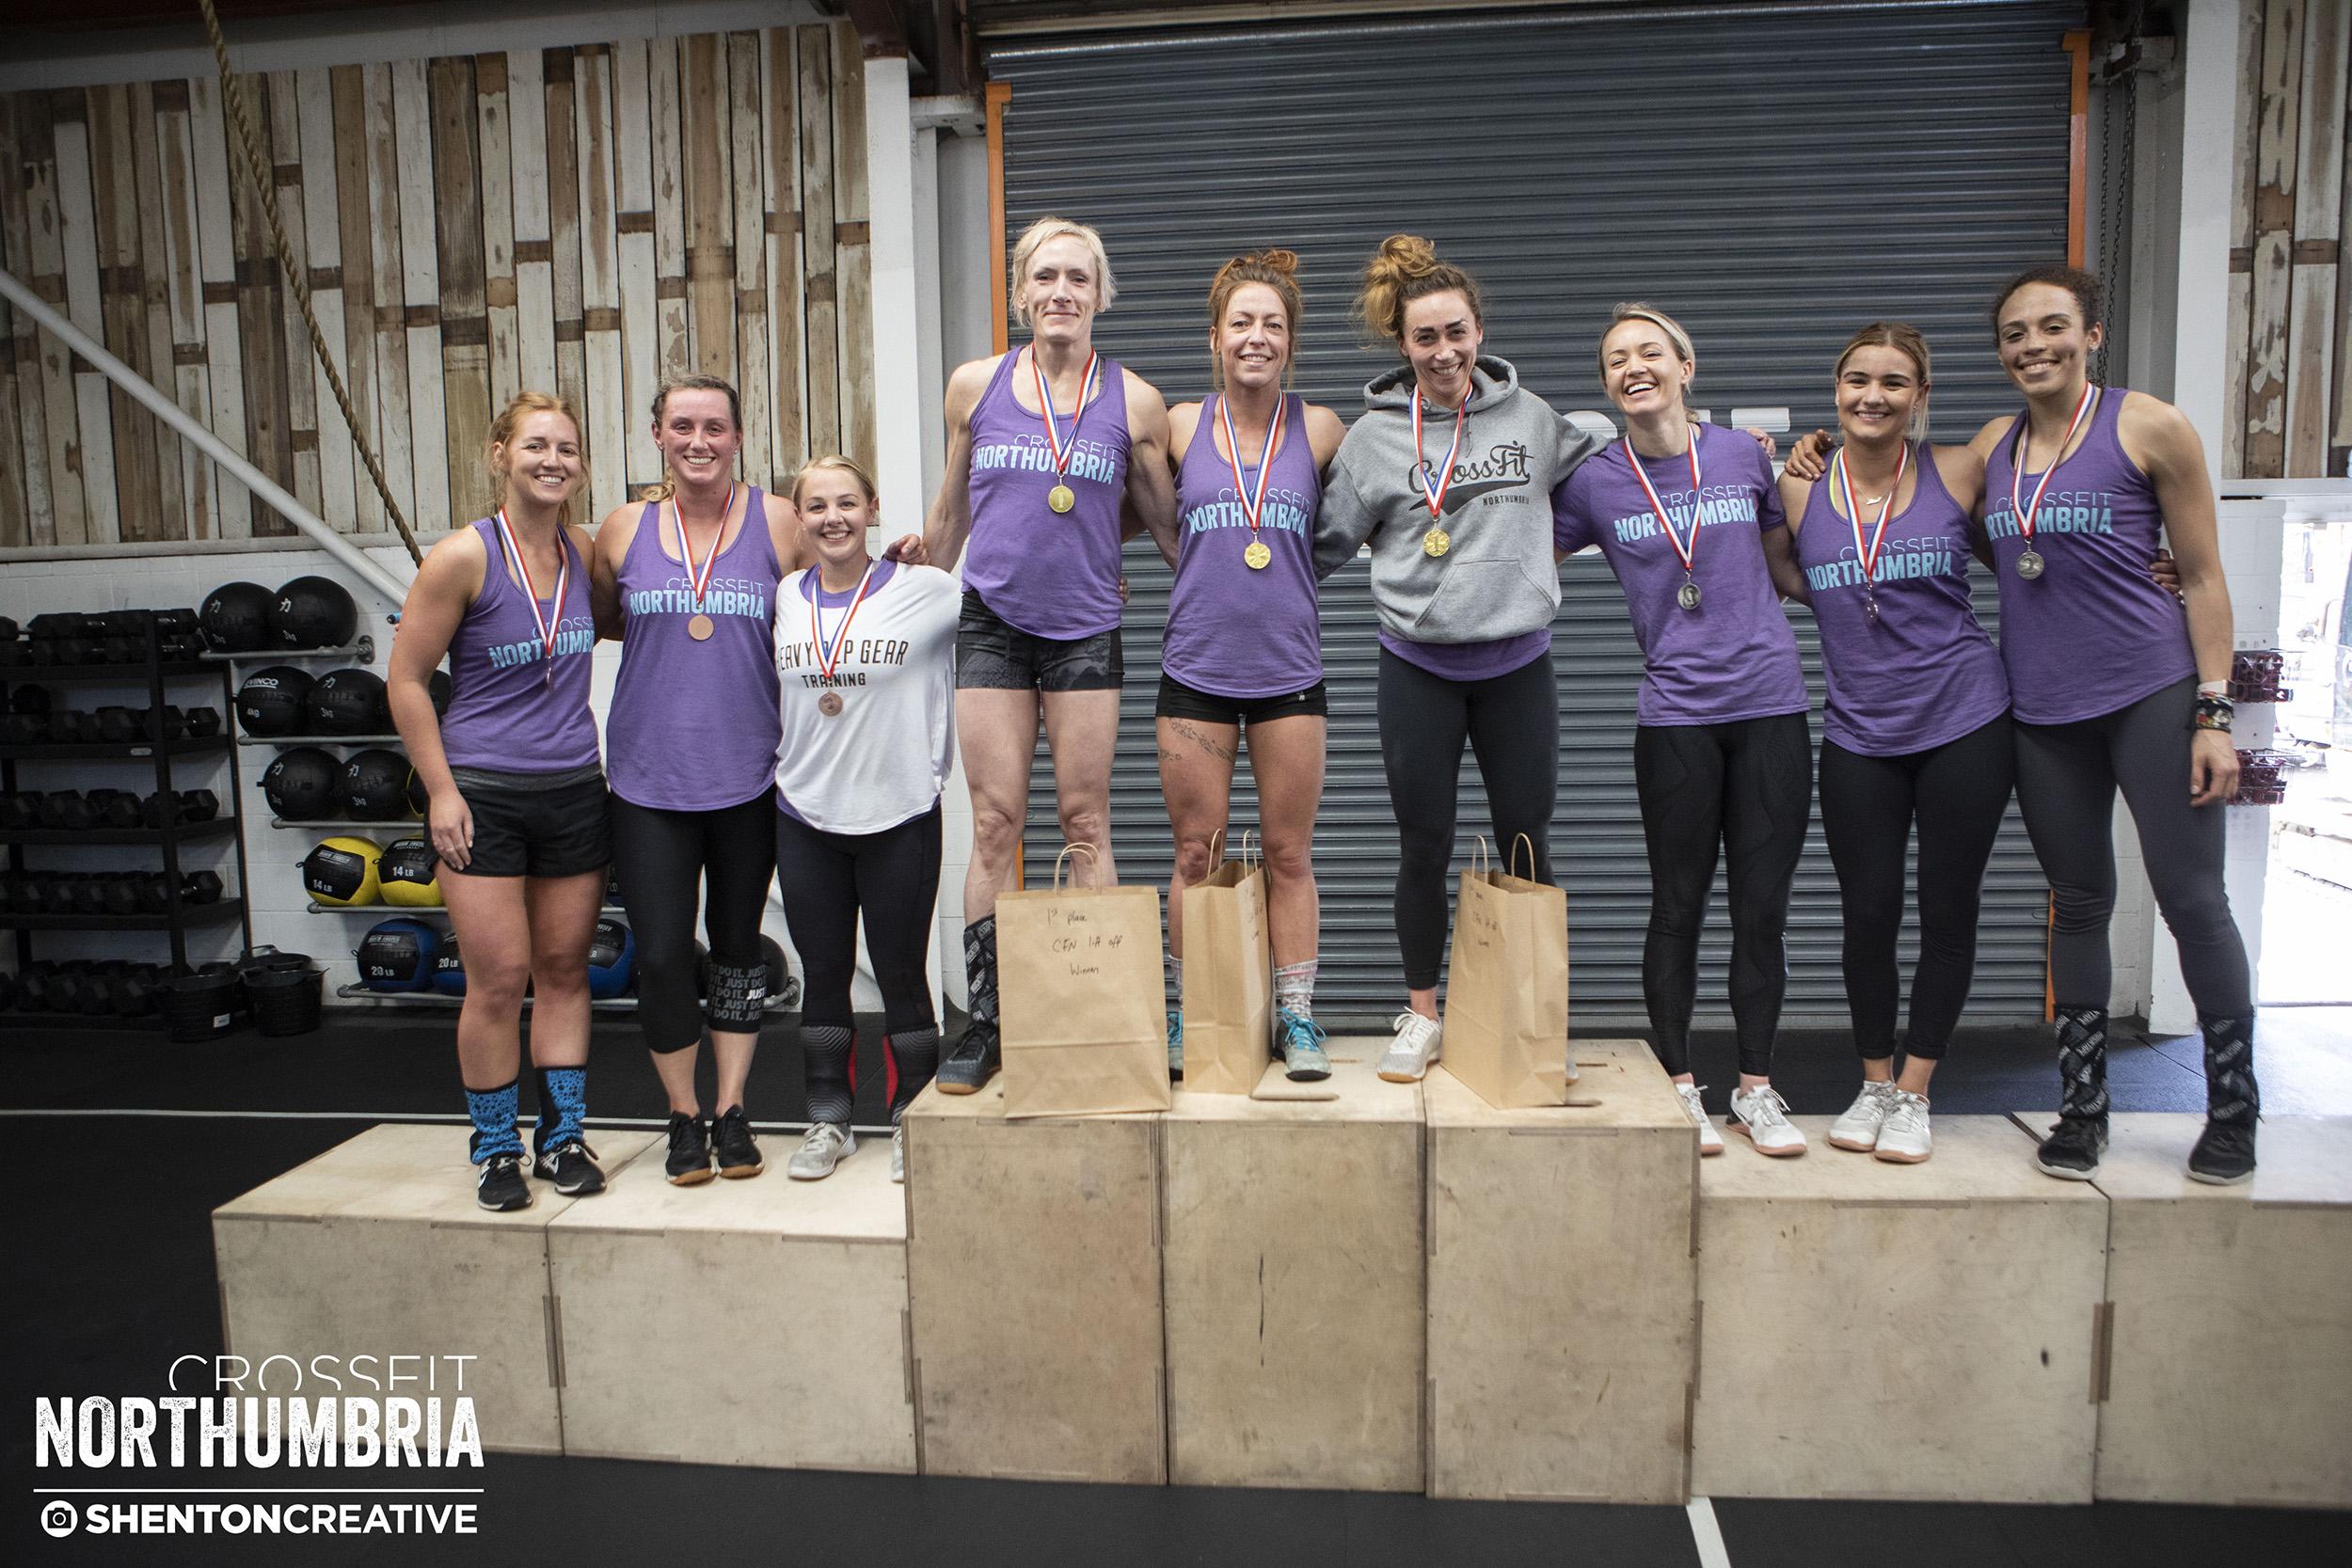 2018 CFN Lift Off - Last years female podium